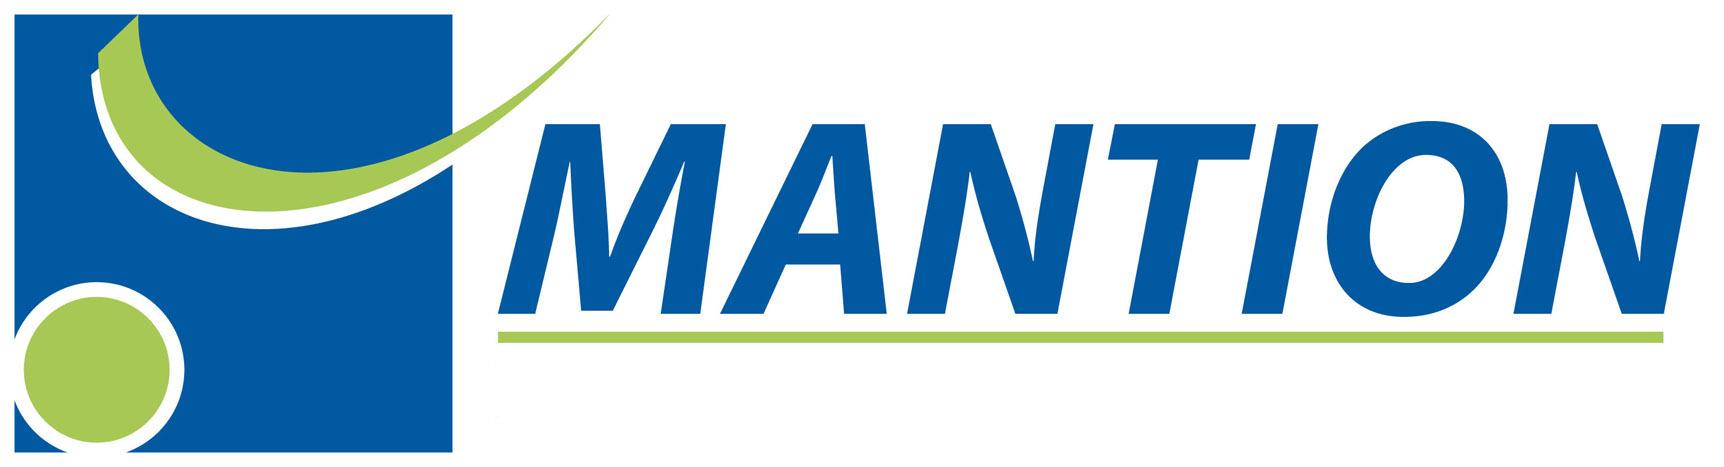 Mantion logo